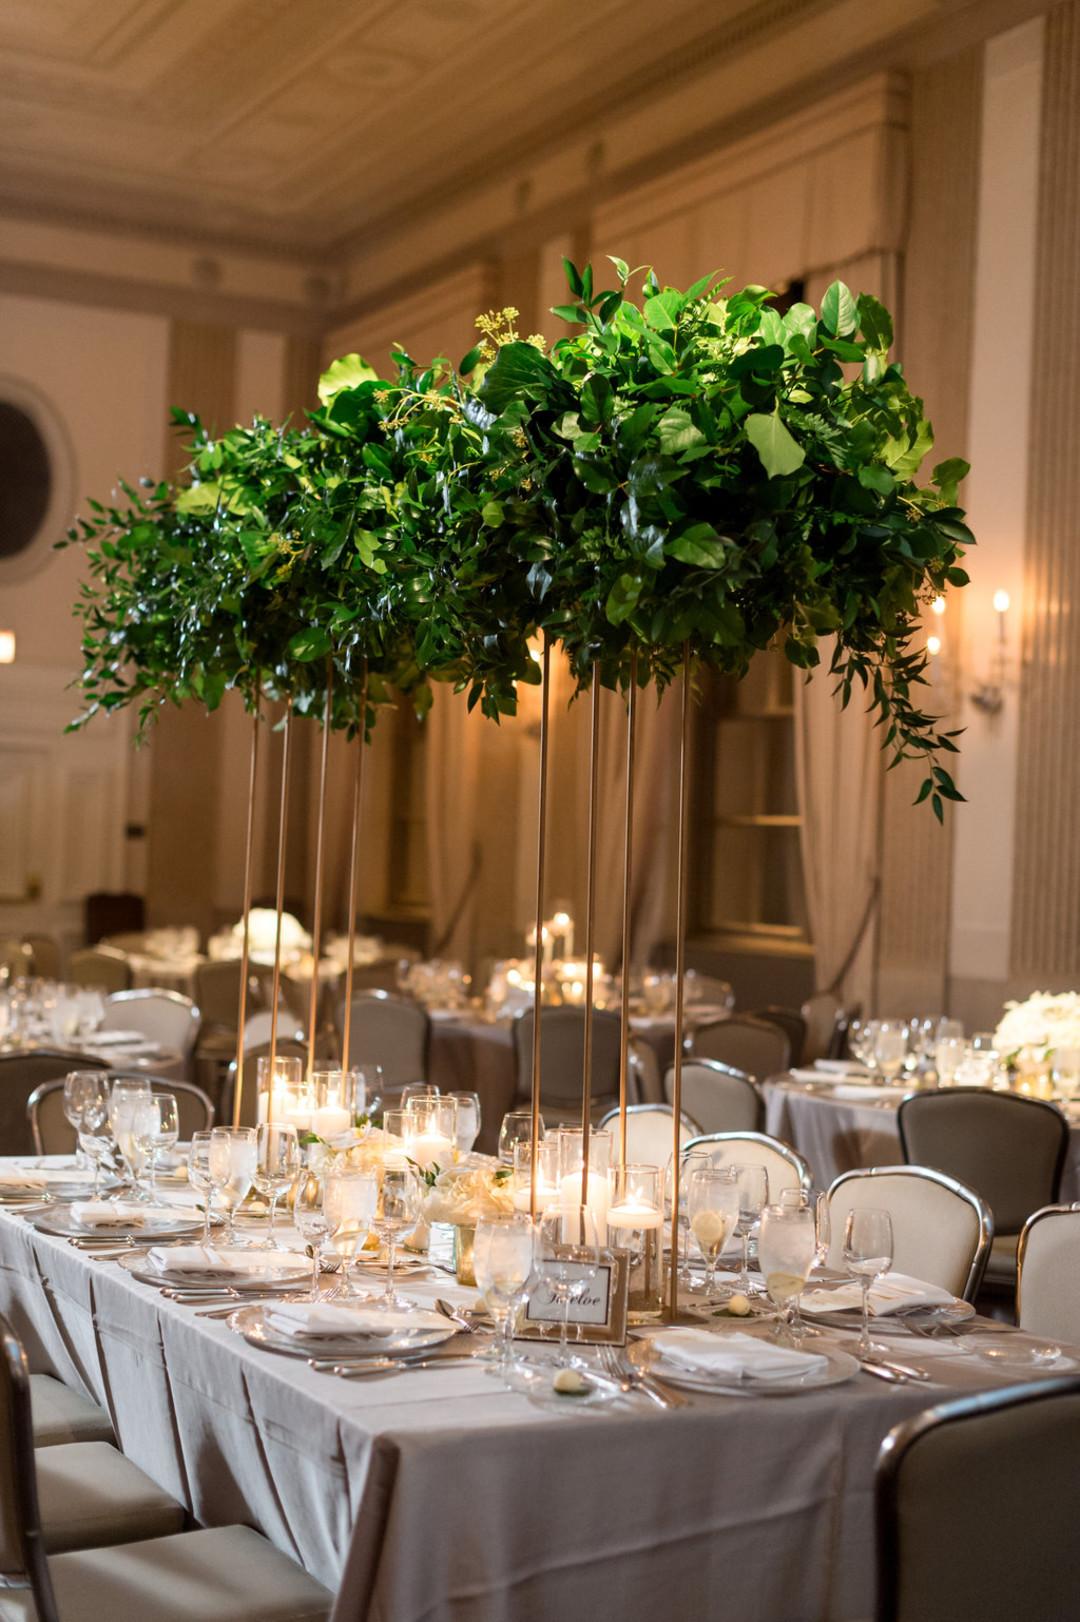 Elegant Greenery Center Pieces The Standard Room Chicago Wedding Julia Franzosa Photography